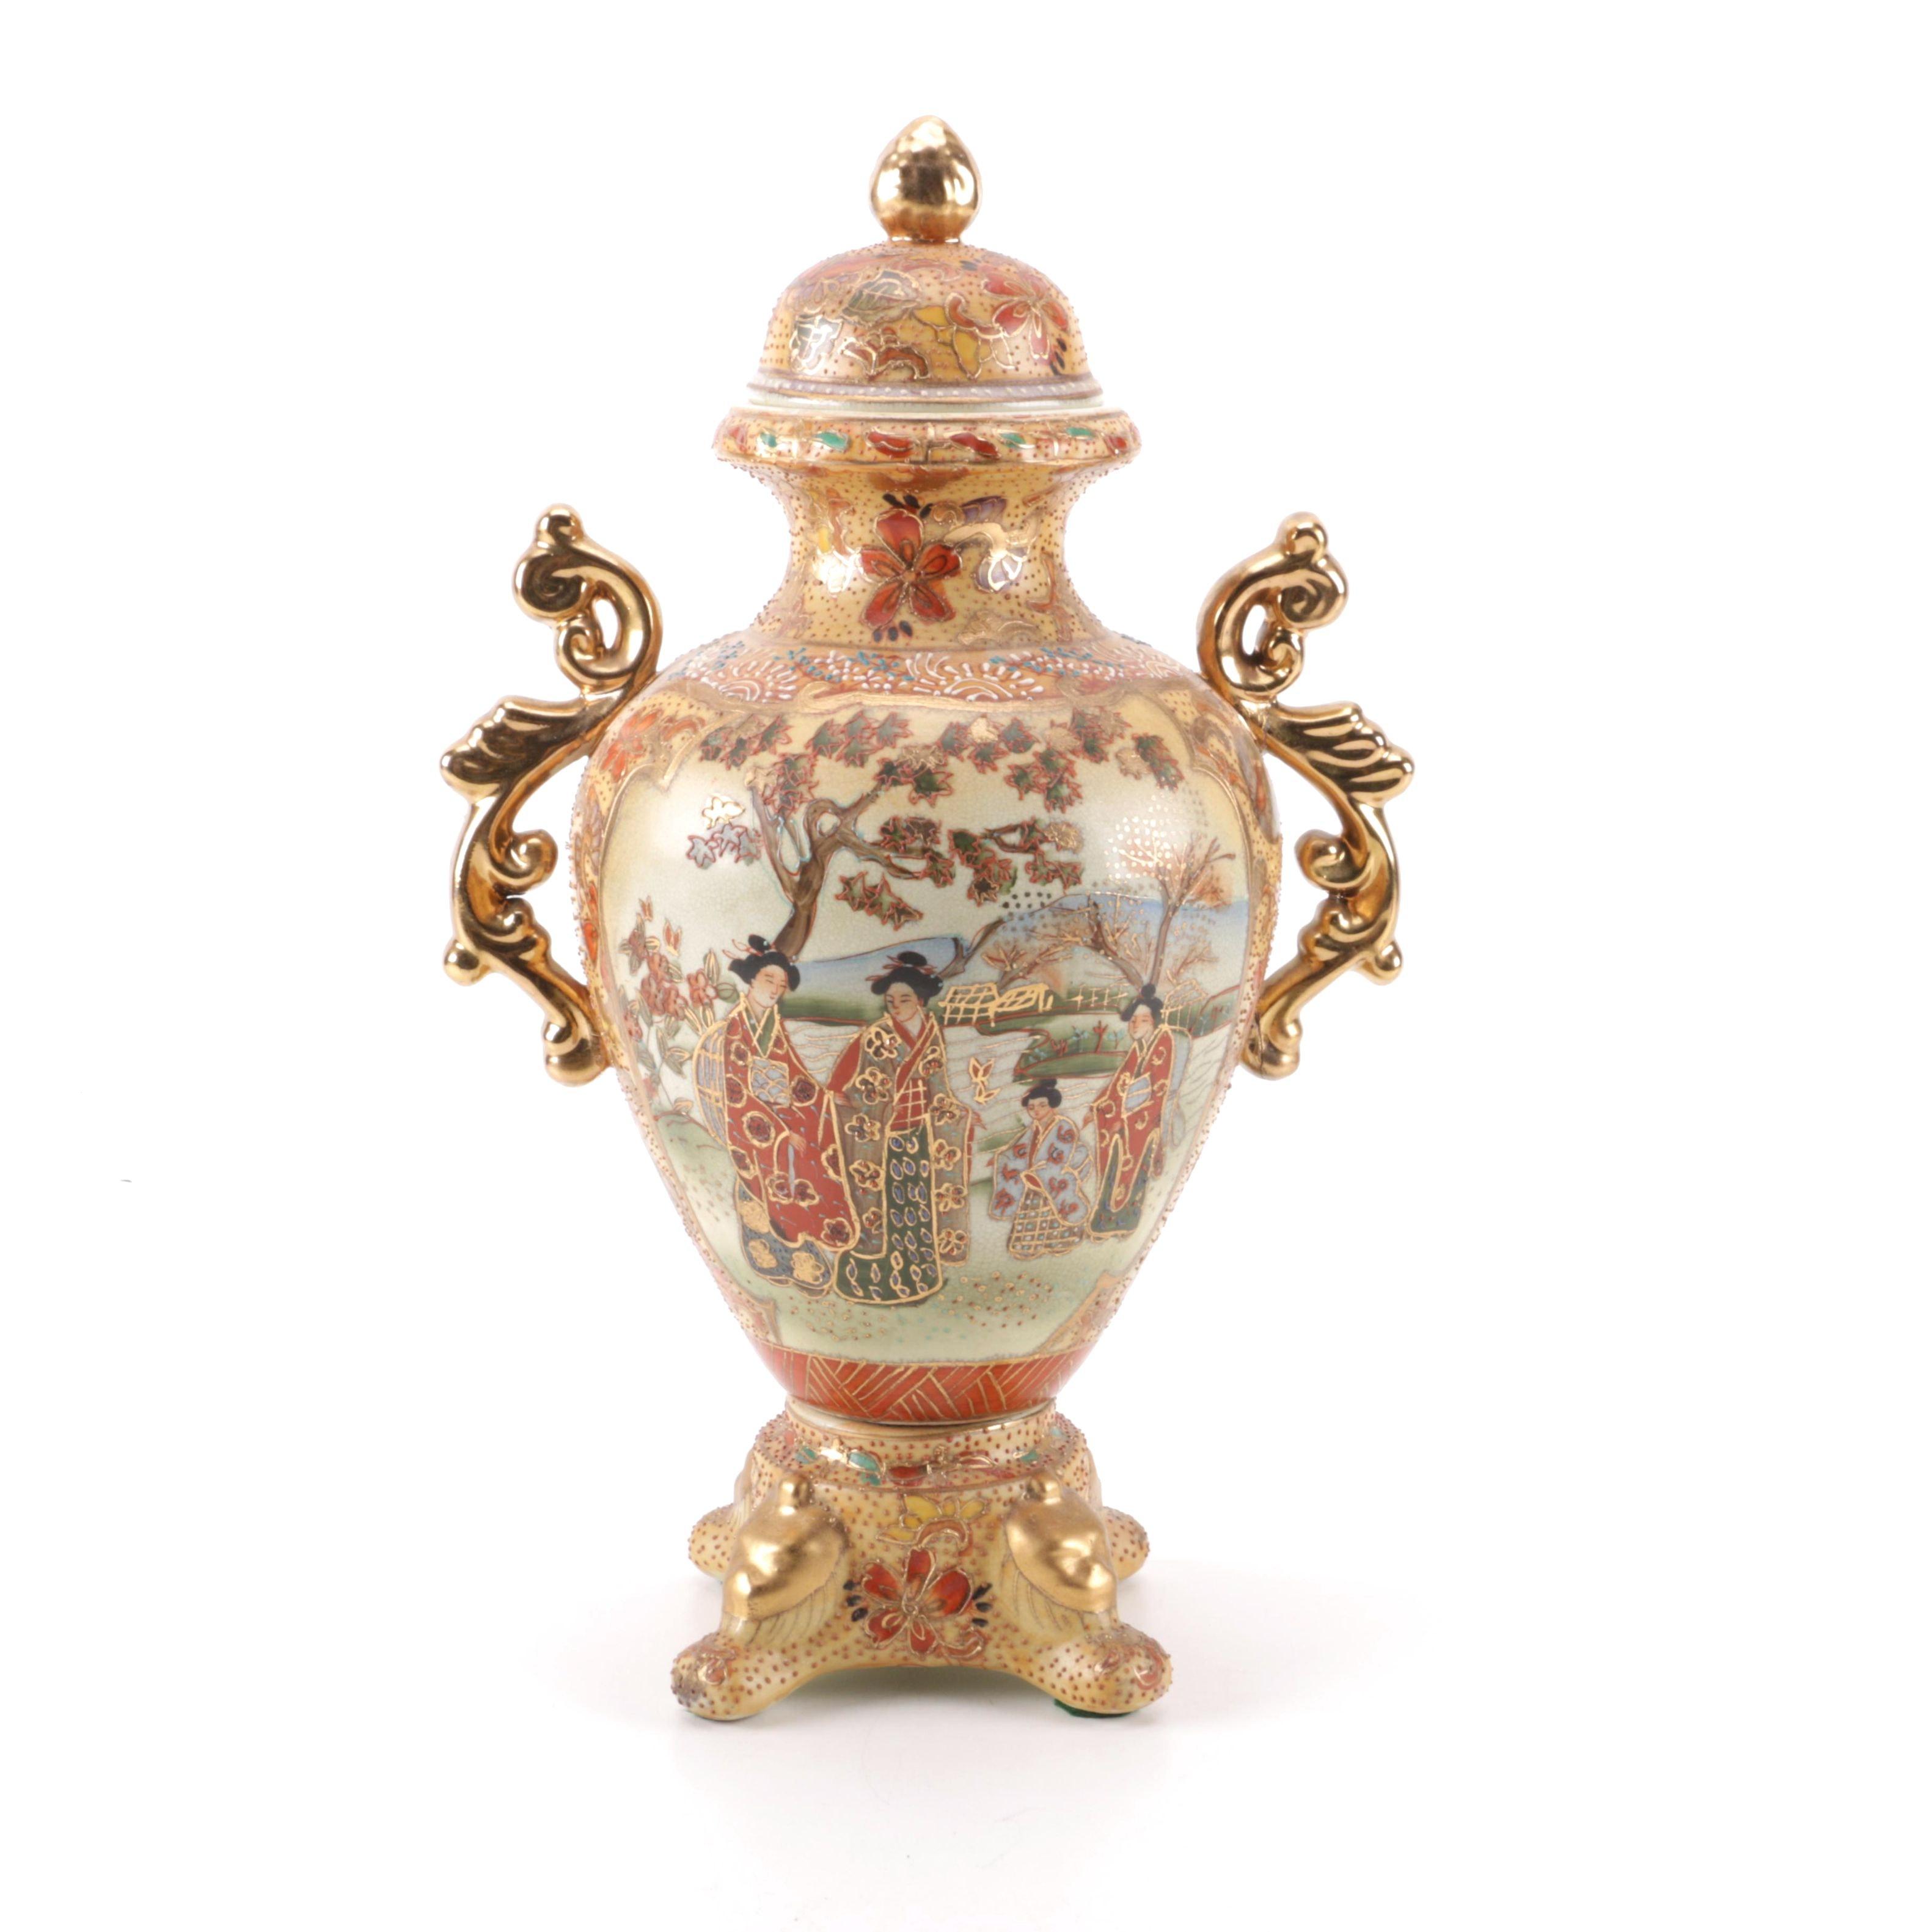 Lidded Chinese Satsuma Style Gilt Accented Urn